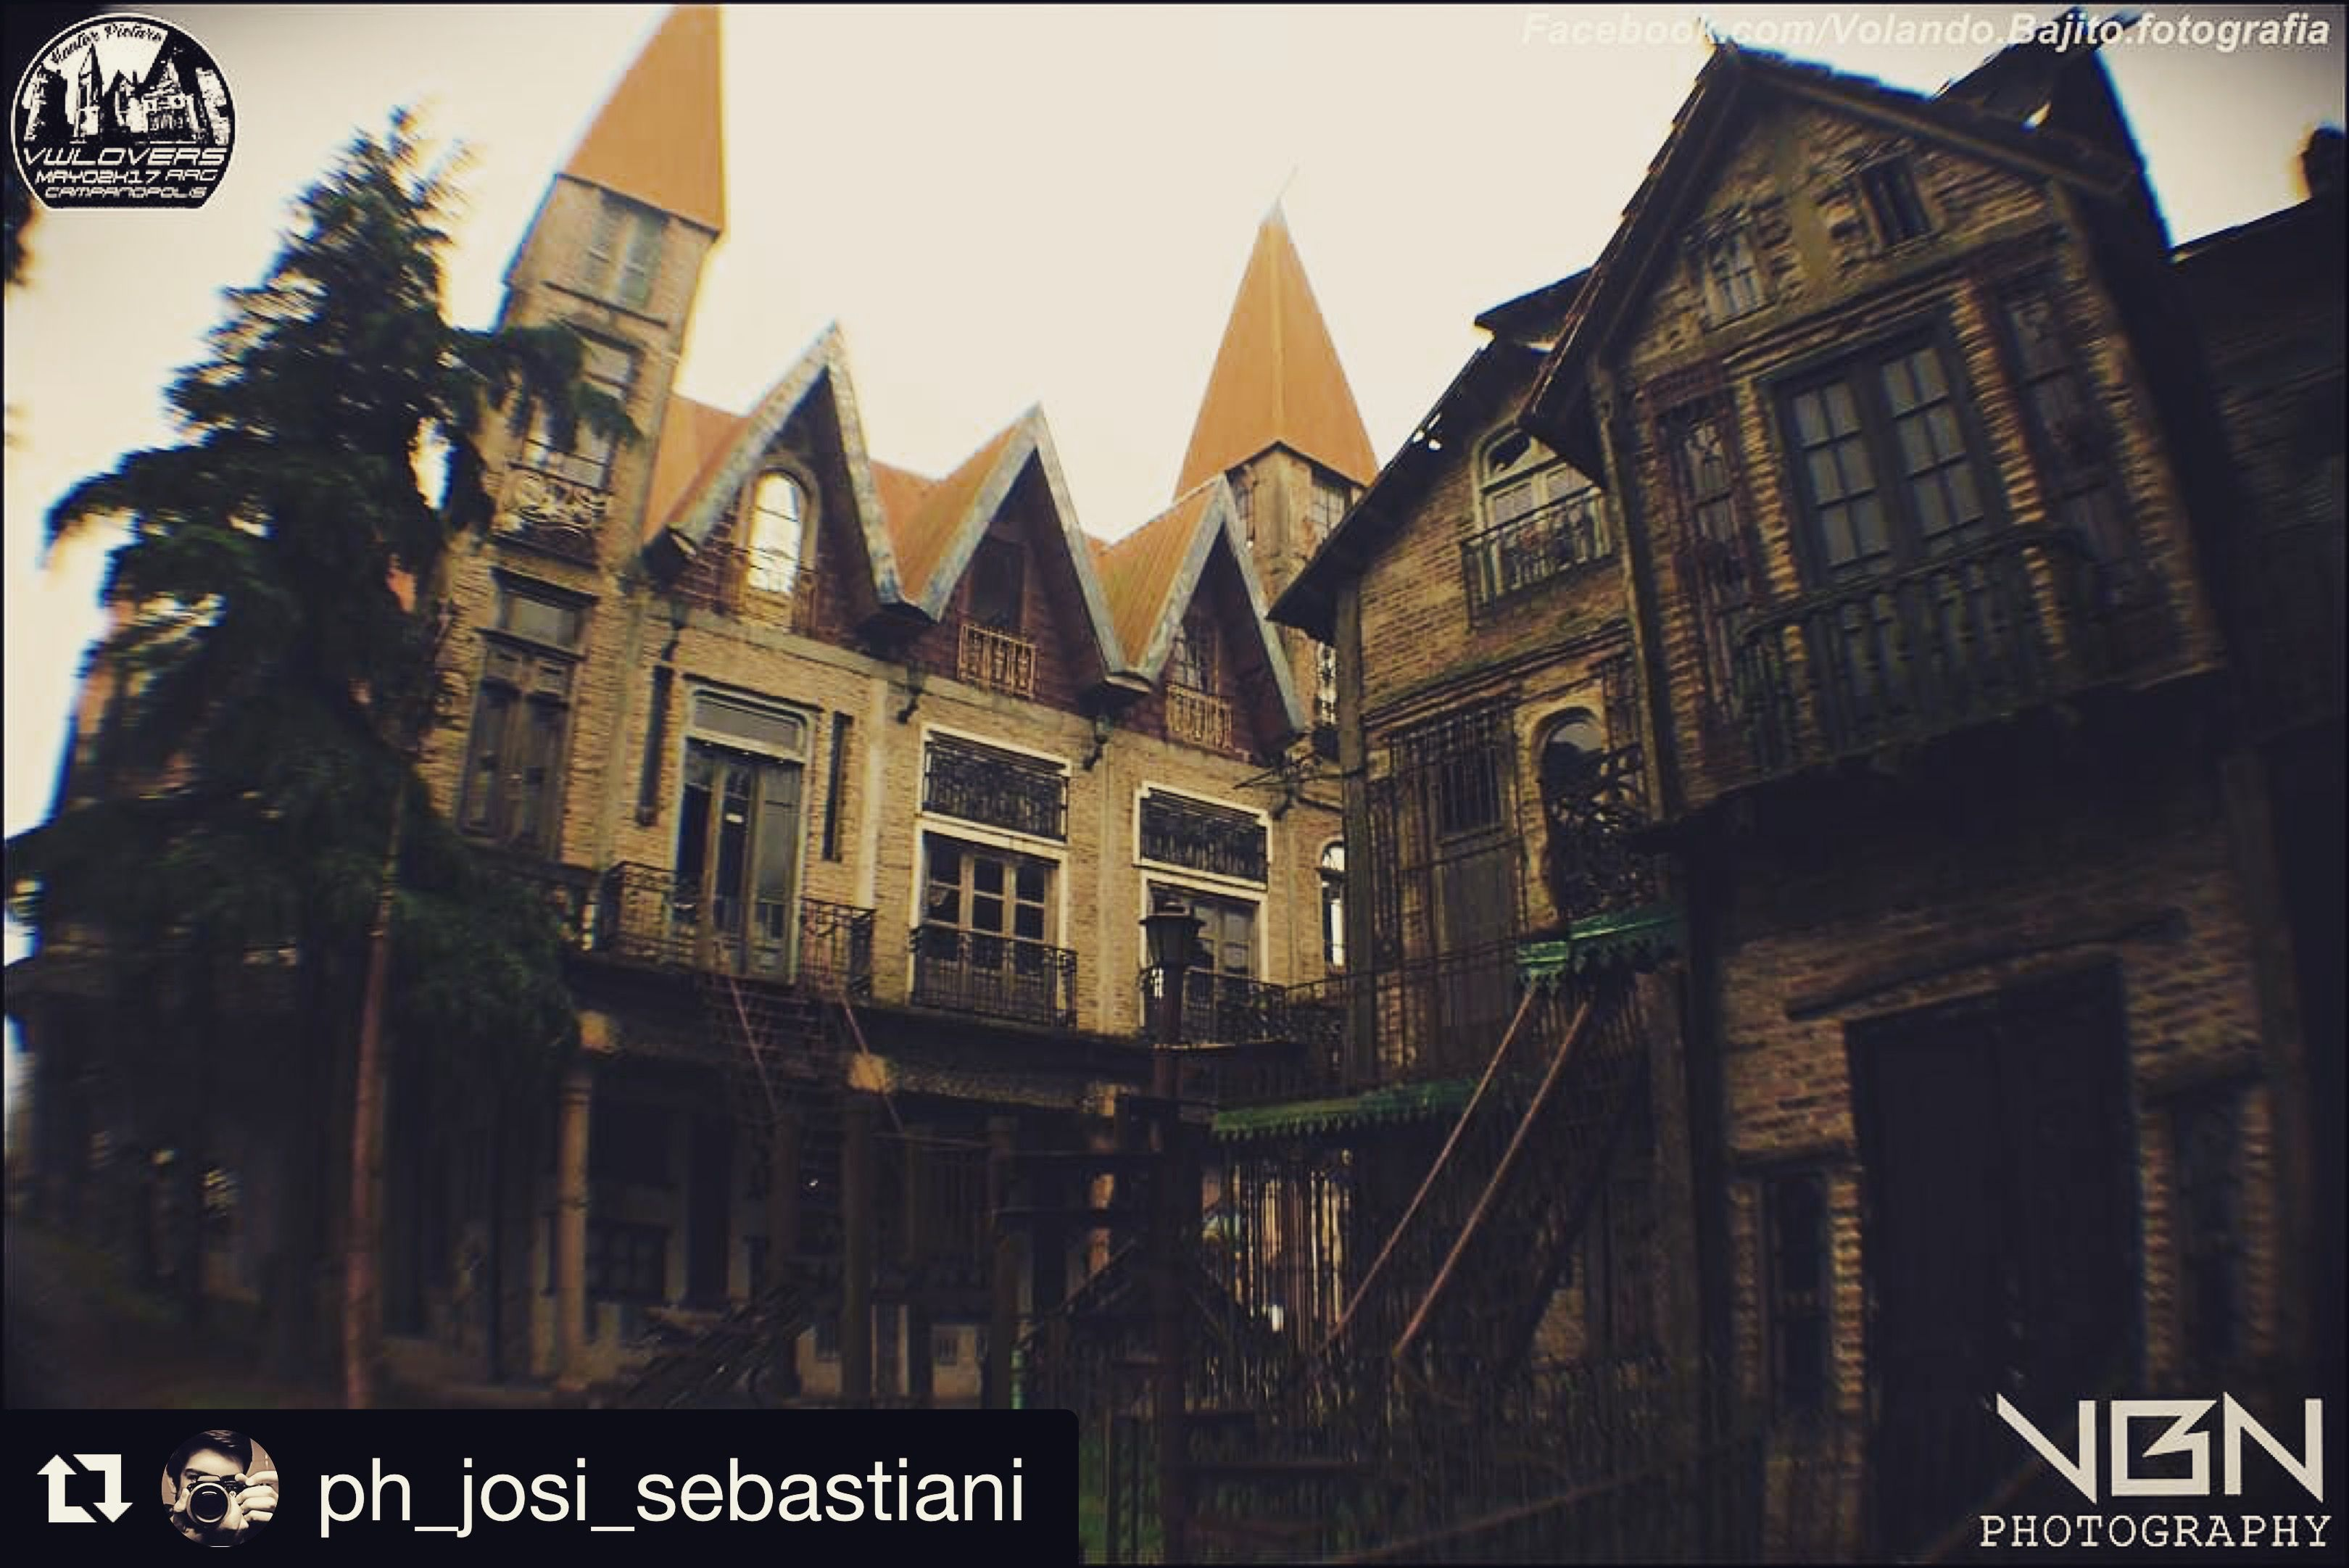 #Repost @ph_josi_sebastiani ・・・ #Medieval #City #Campanopolis Mañana con neblina